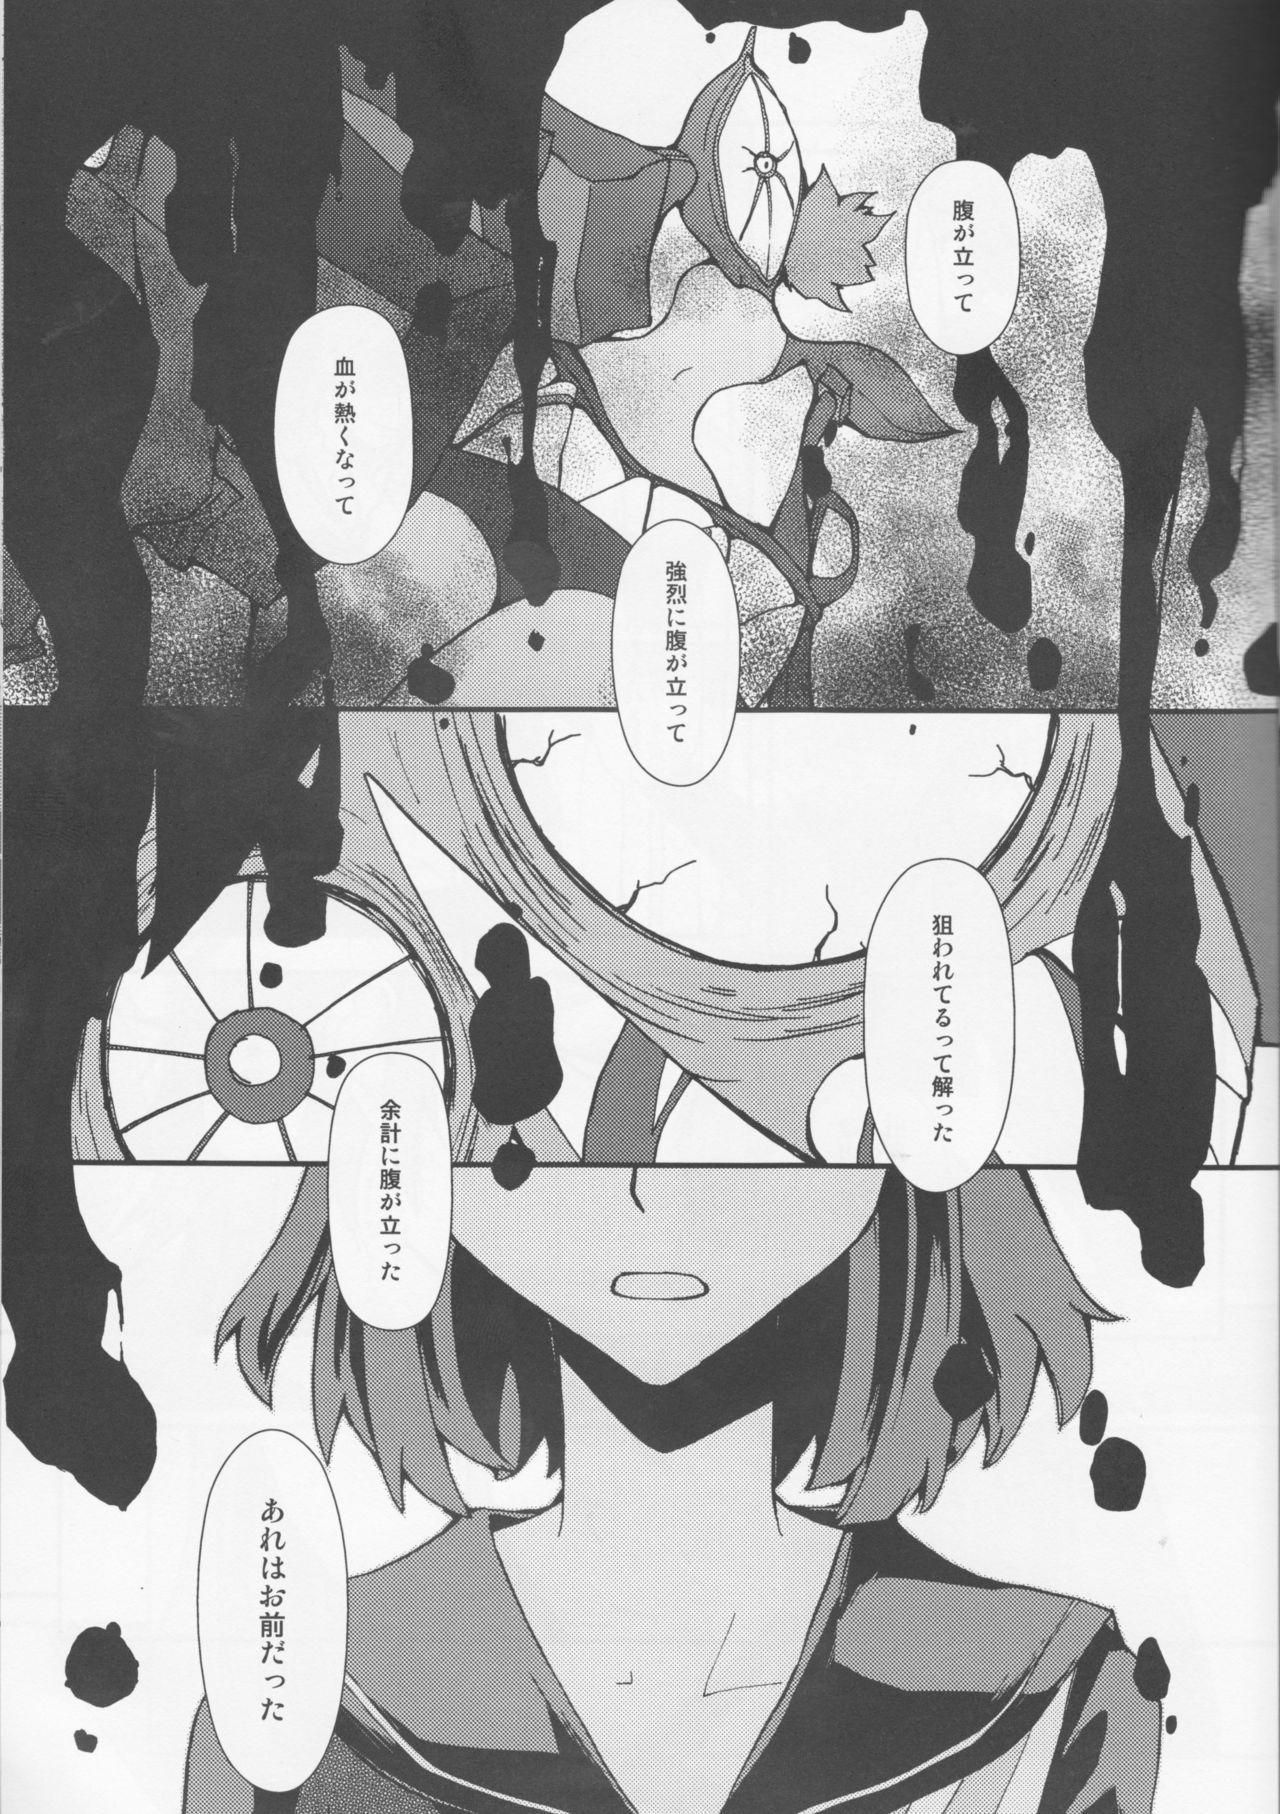 [Daylight (Ren Mizuha)]Usukurenaiiro no hana saku koro(Kill la Kill)) 5